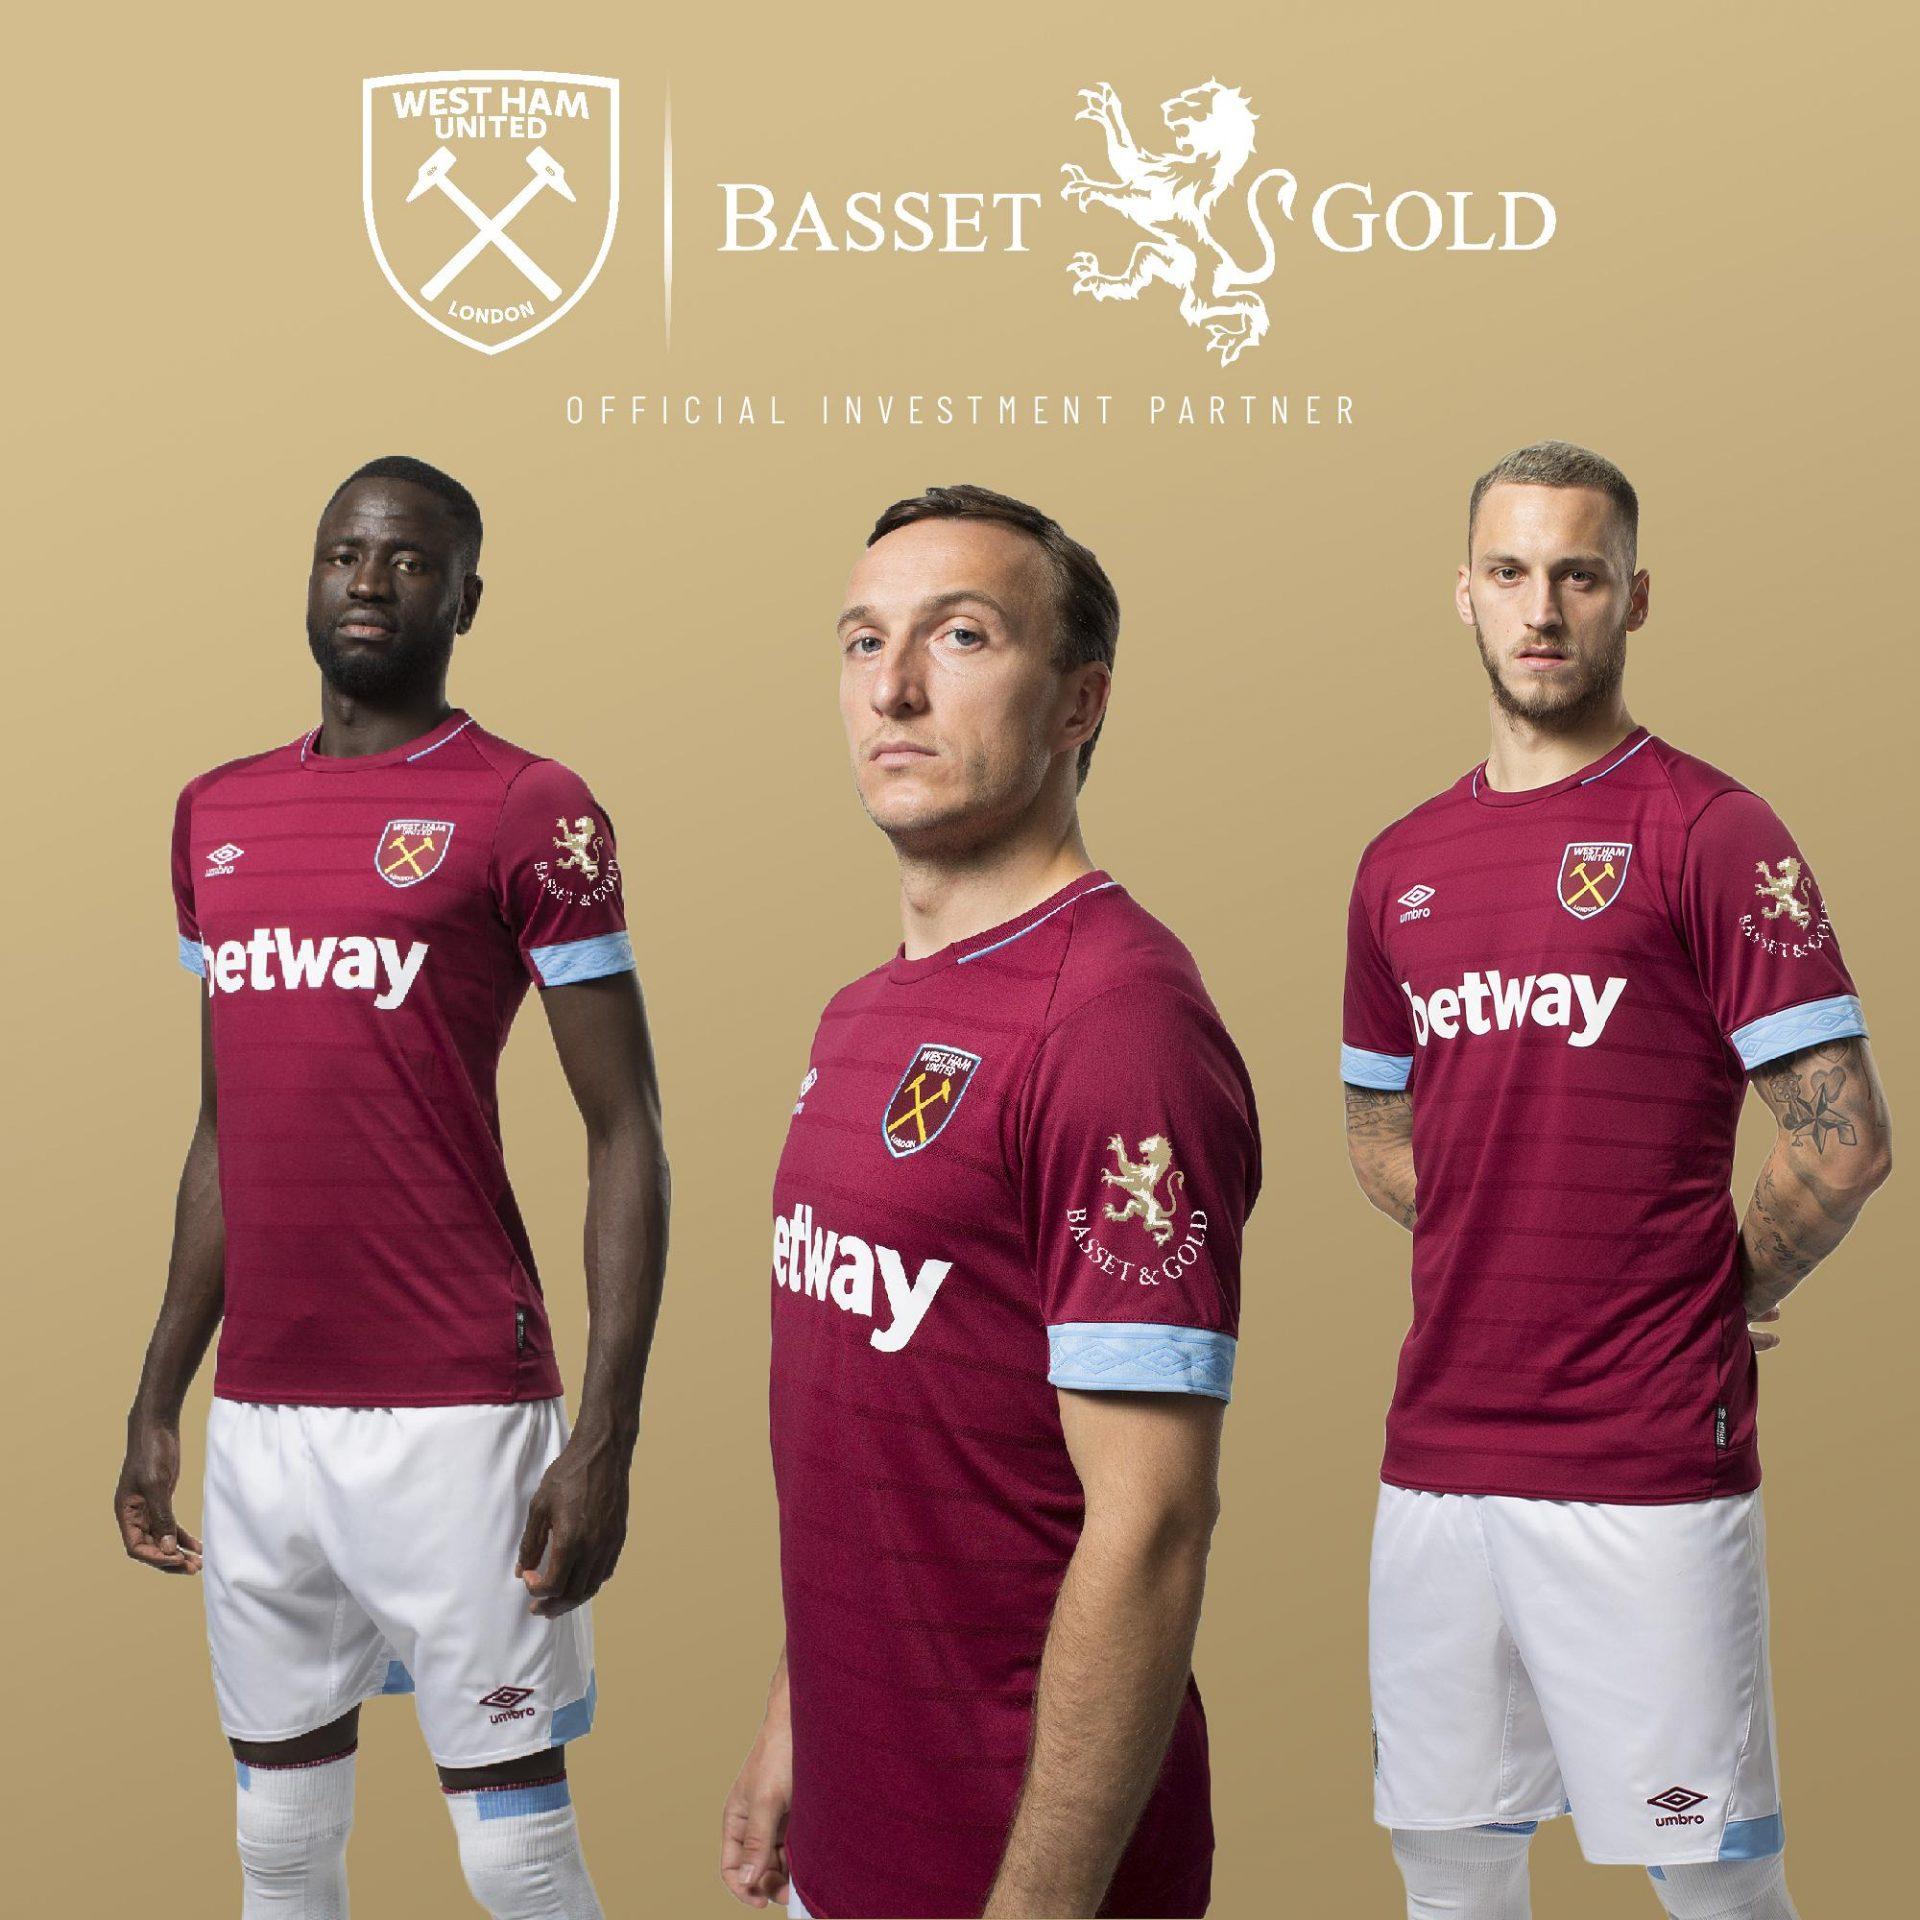 West Ham United Bassels and Gold Shirt Sleeve Sponsor Logo Brand Premier League Football Clubs